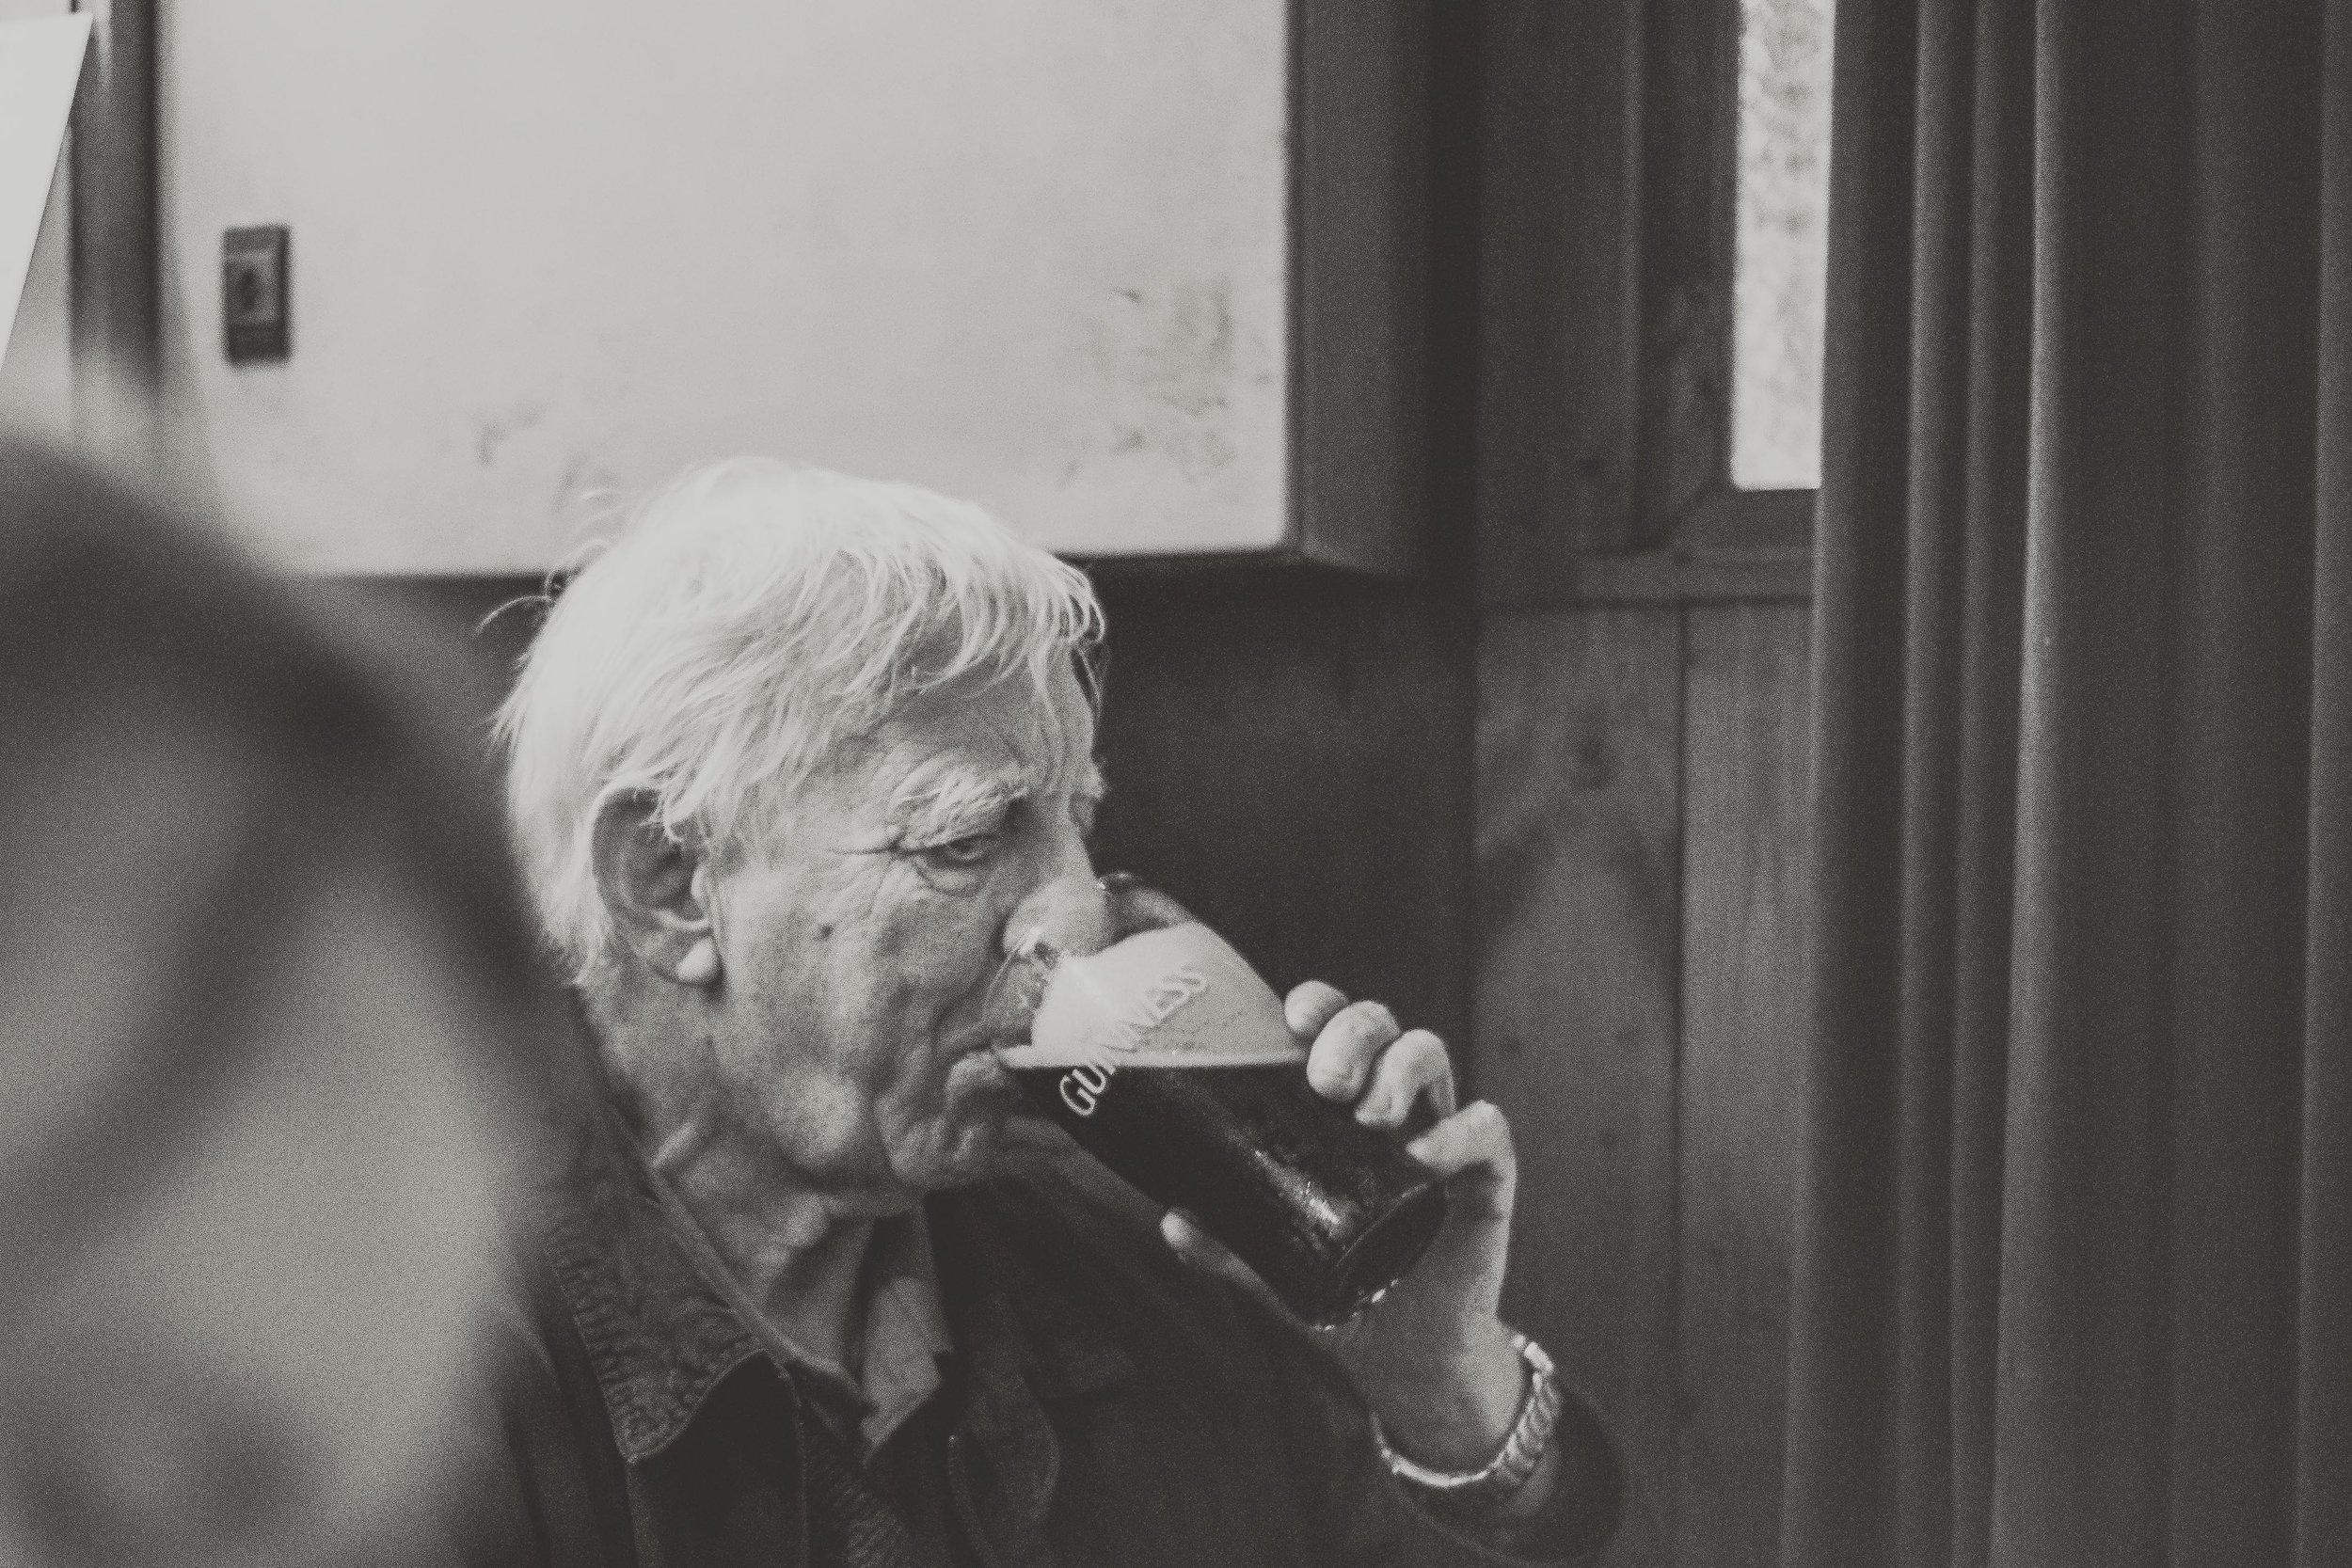 county cork. cork. ireland. irish. history. city. house sitting. old. travel. travel photography. travel photographer. lough hyne. hiking. outdoor. adventure. old man drinking pint..jpg